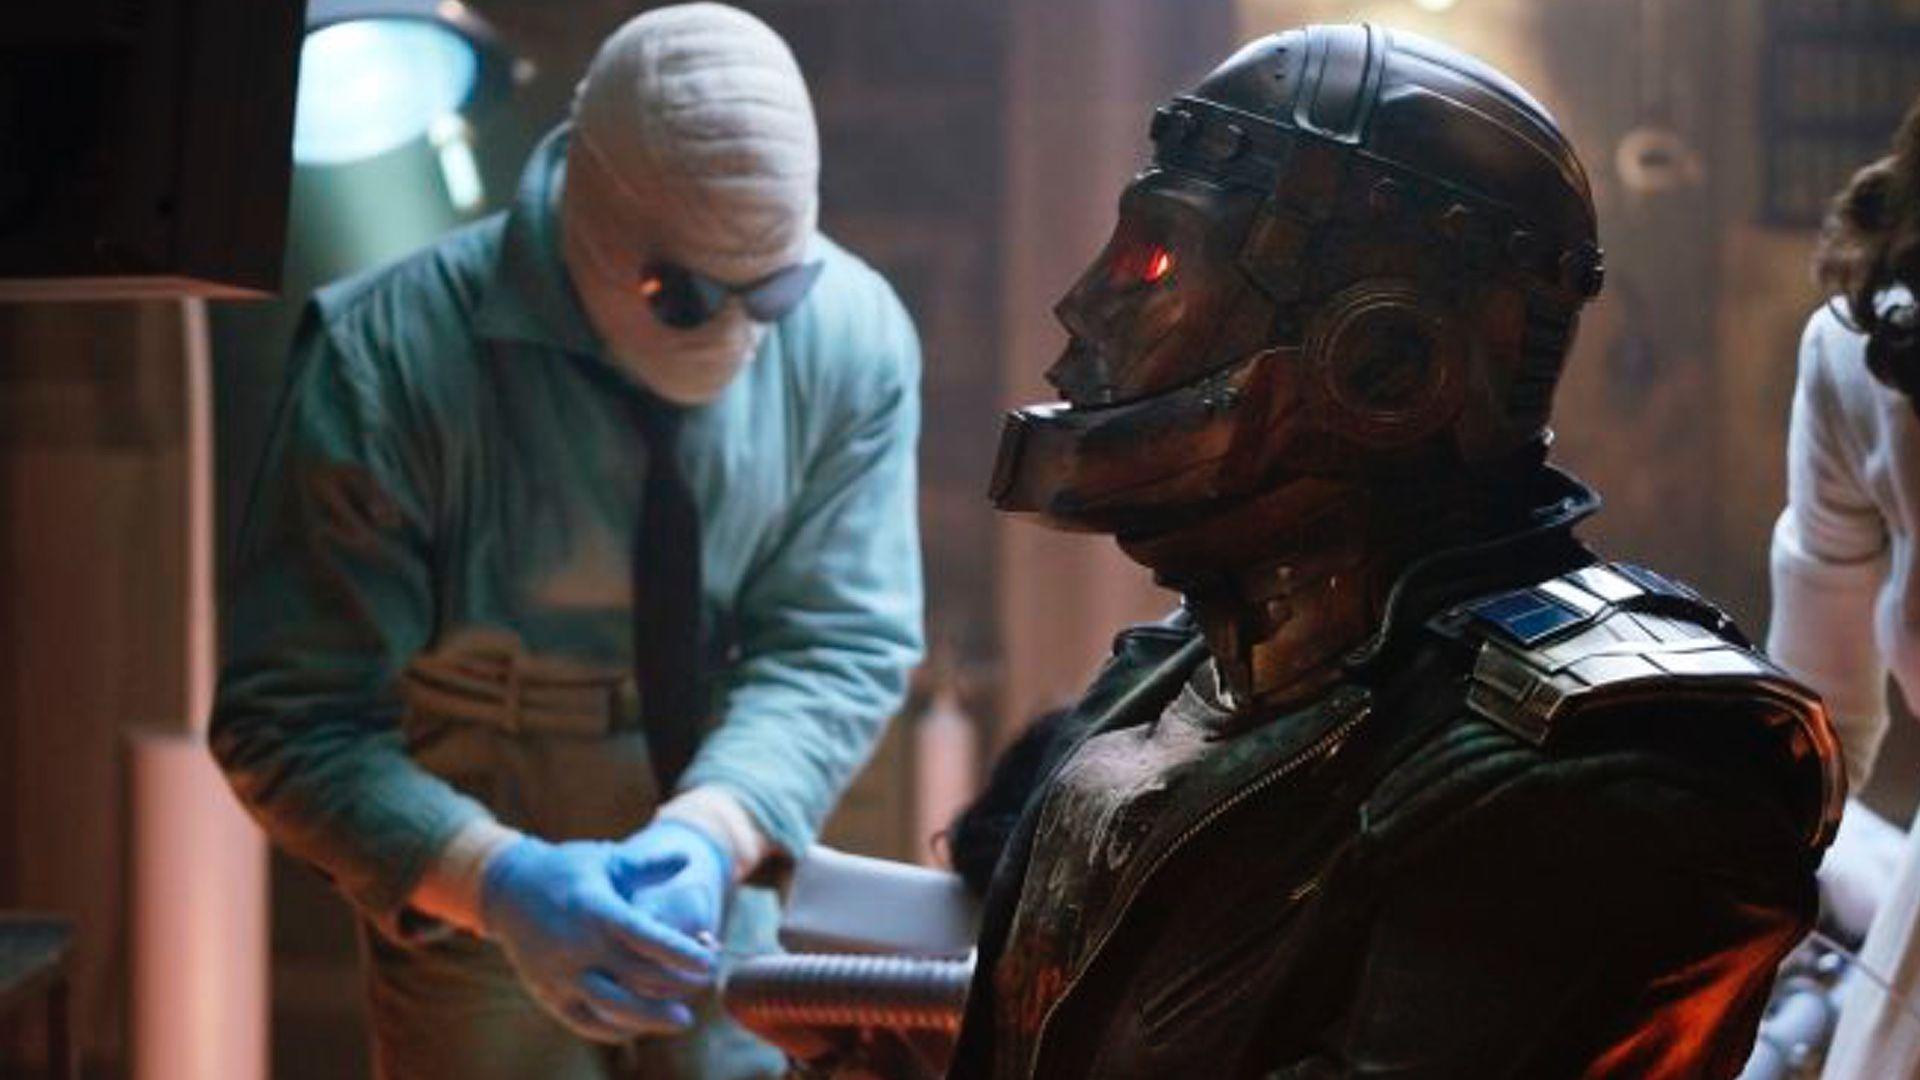 New Promo Spots For Dc S Doom Patrol Spotlight Robotman And Crazy